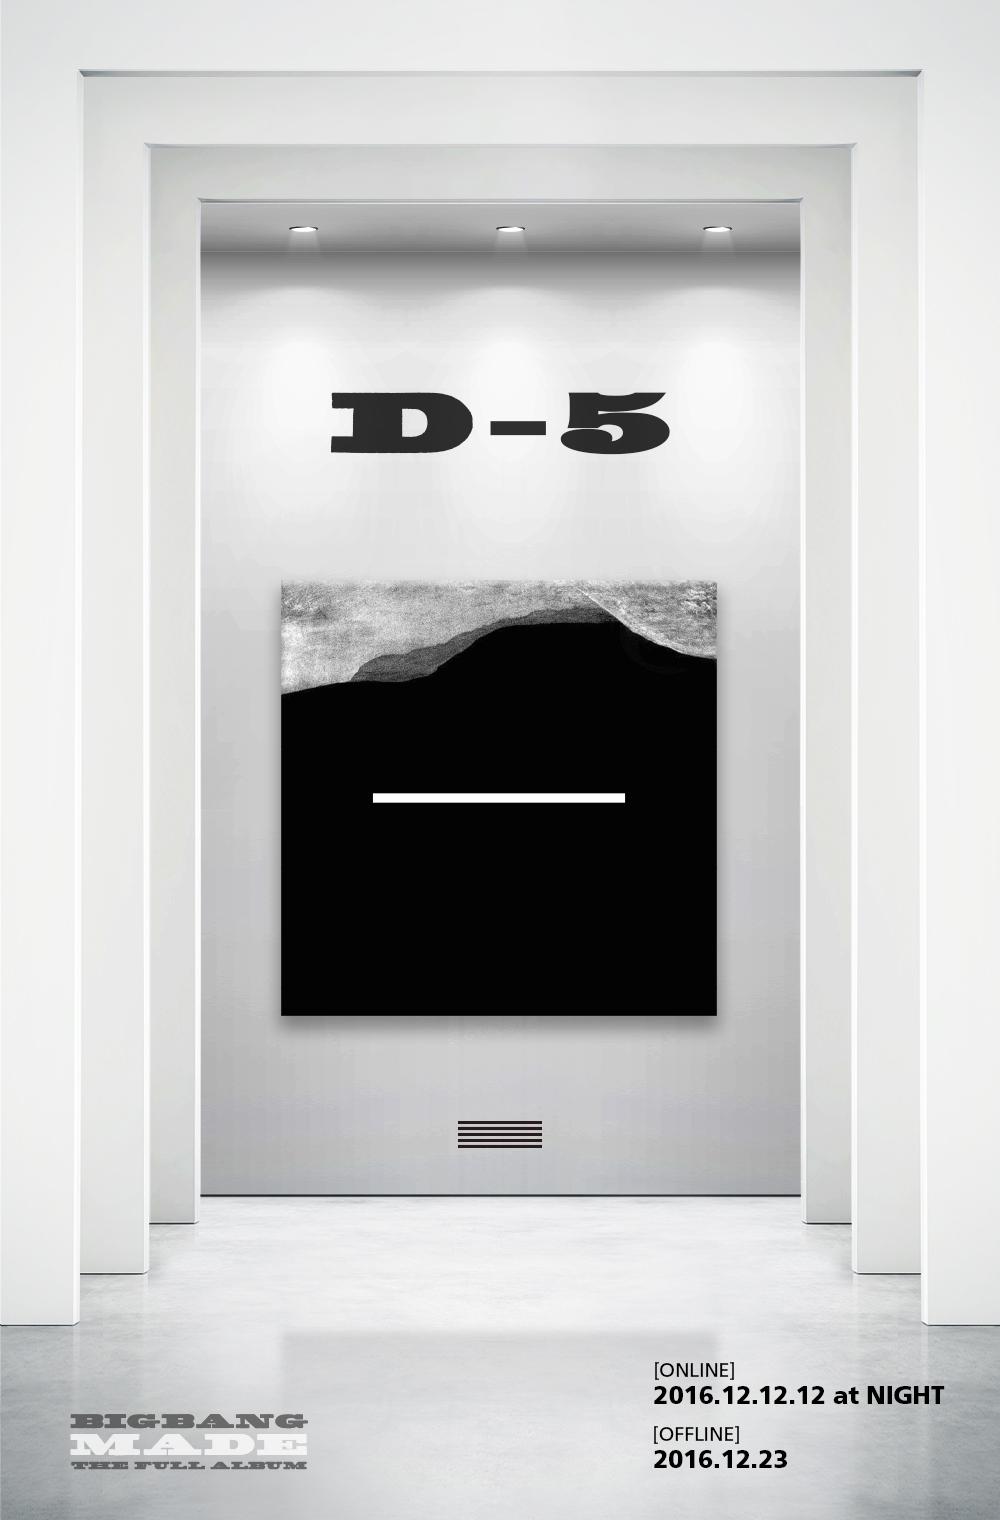 BB-DDAY-5_f